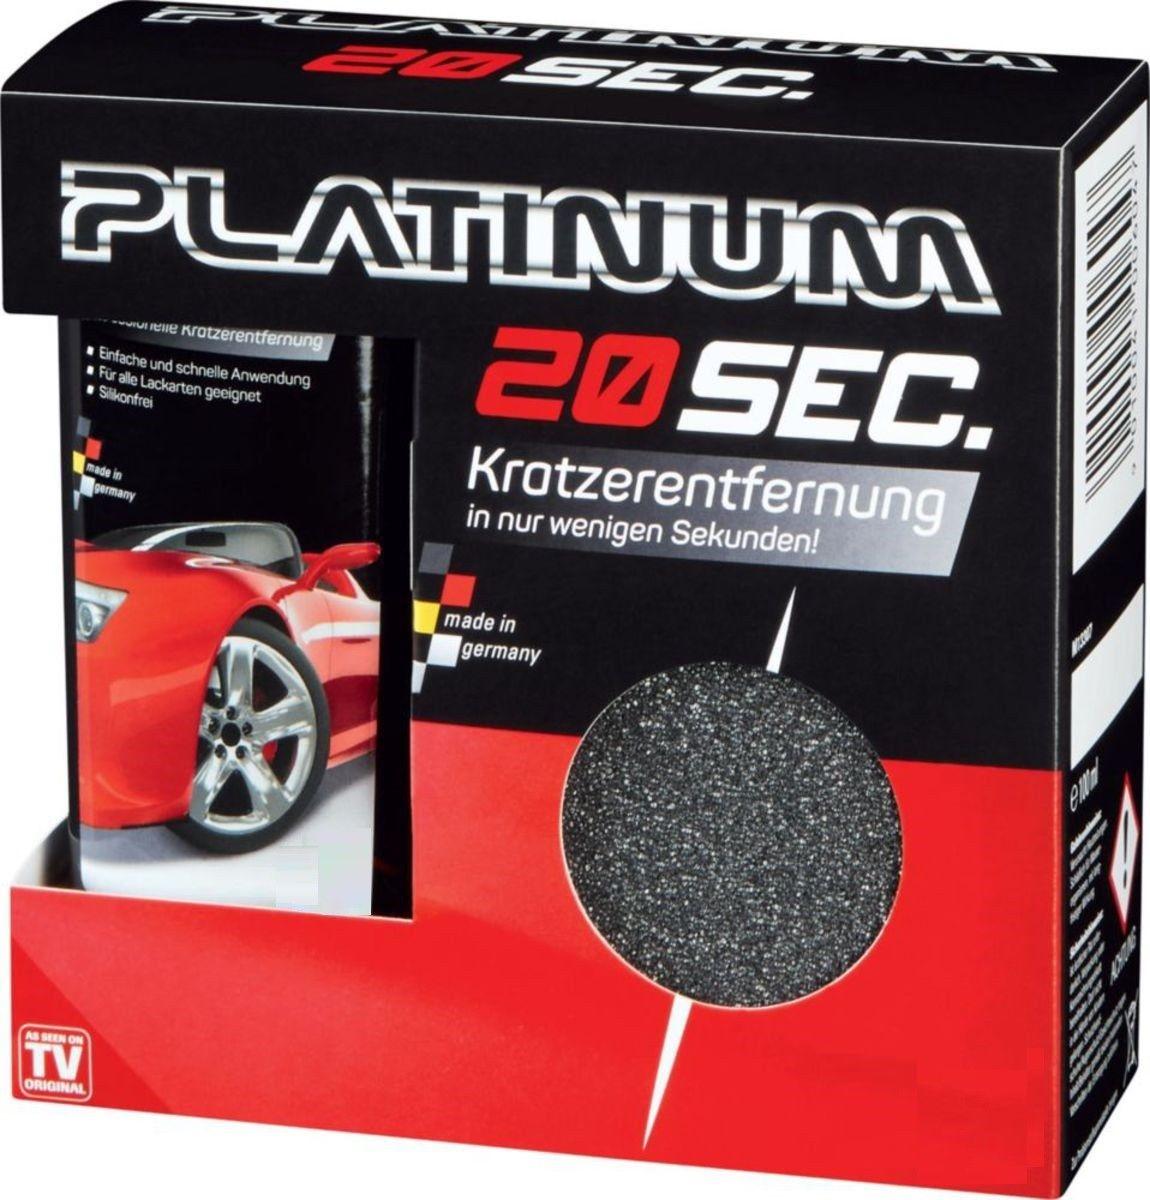 Platinum 20 sec. - professionelle Kratzerentfernung // in 20 SEK - SECOND NEU !!